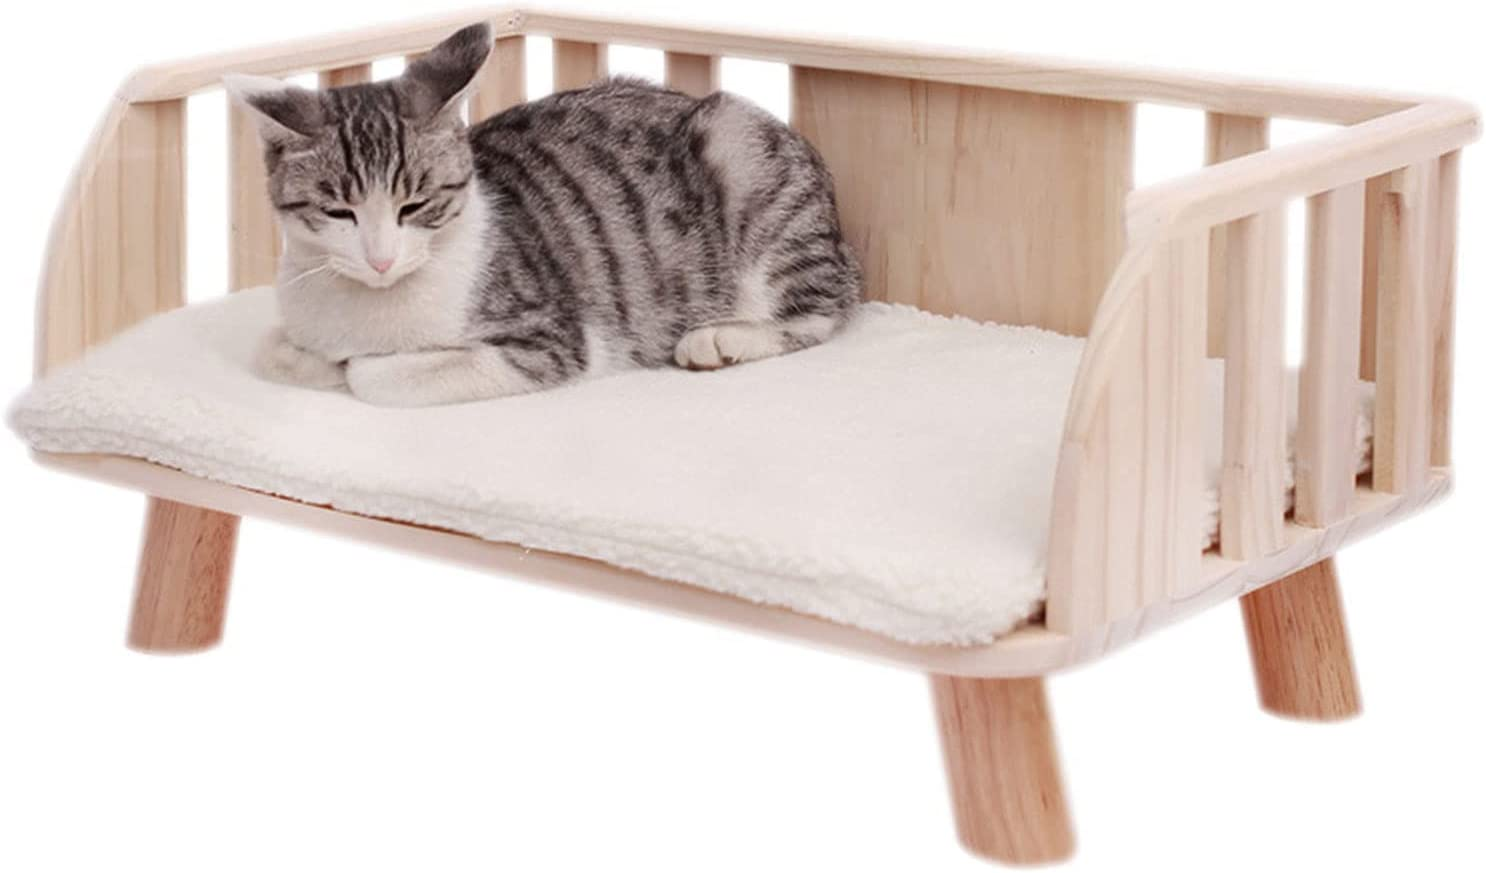 CHENGLONGTANG Pet Alternative dealer Supplies Dog Four-Season Luxury goods Bed Sofa Wooden